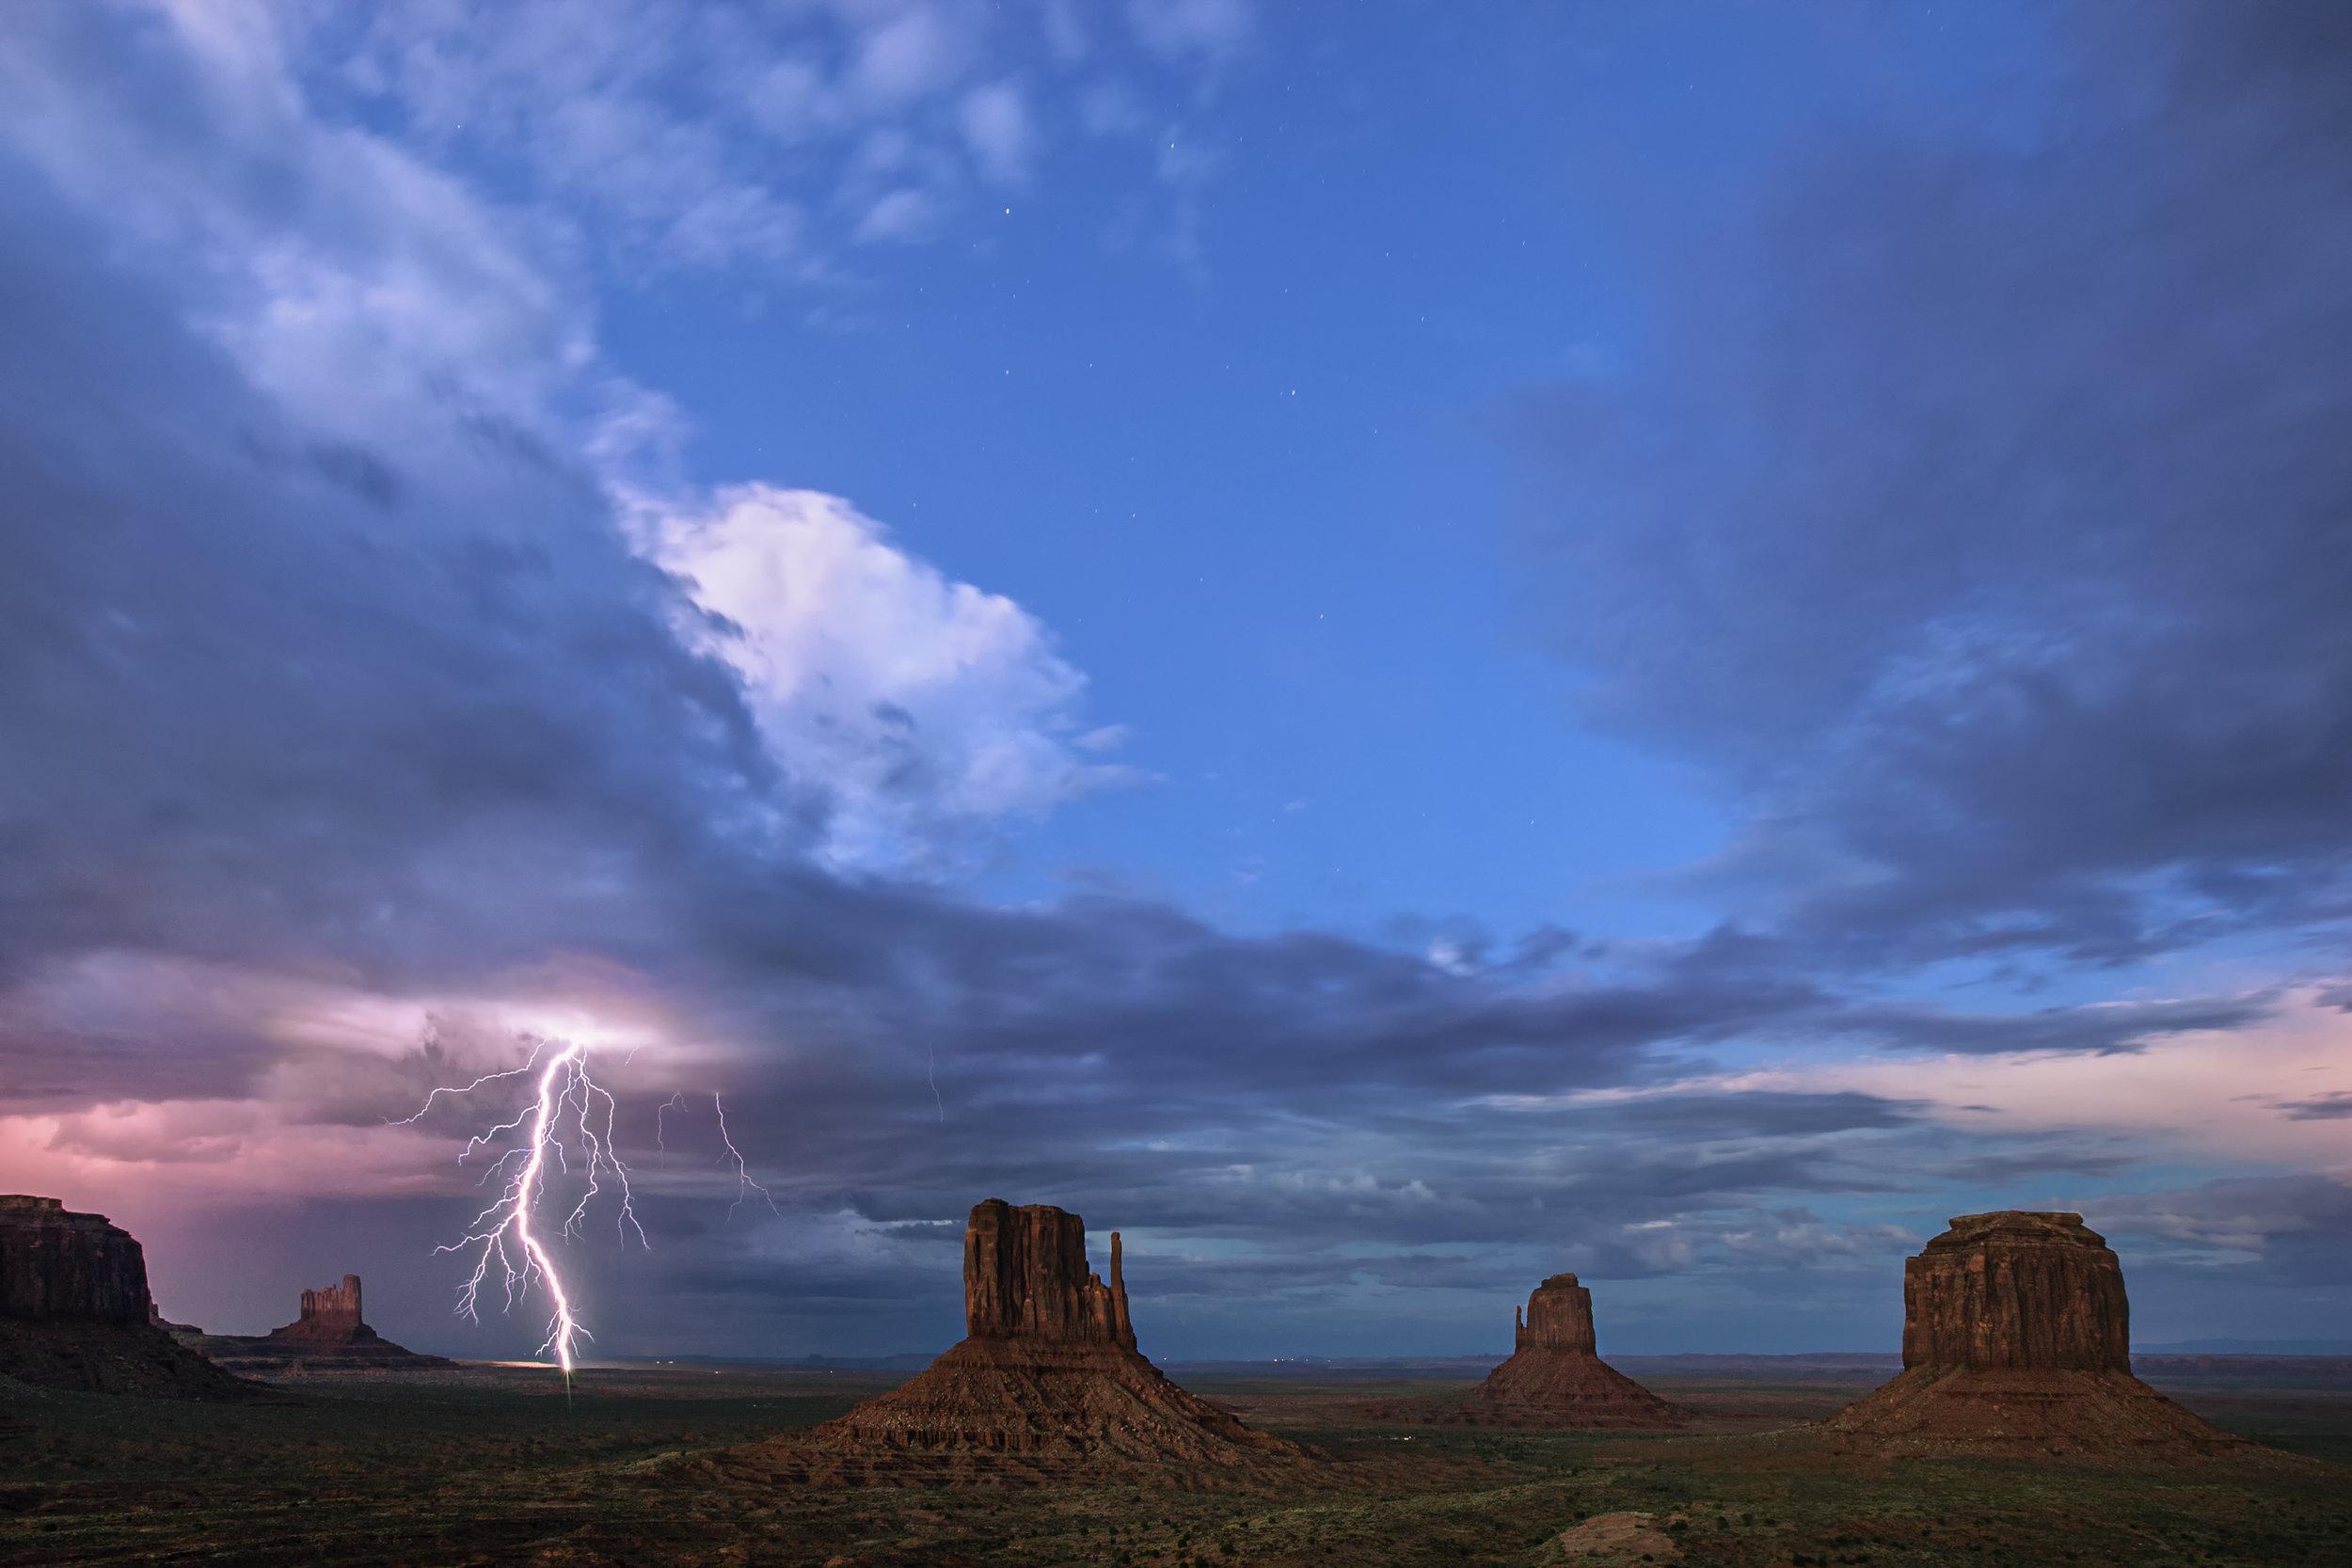 monsoon storm chasing